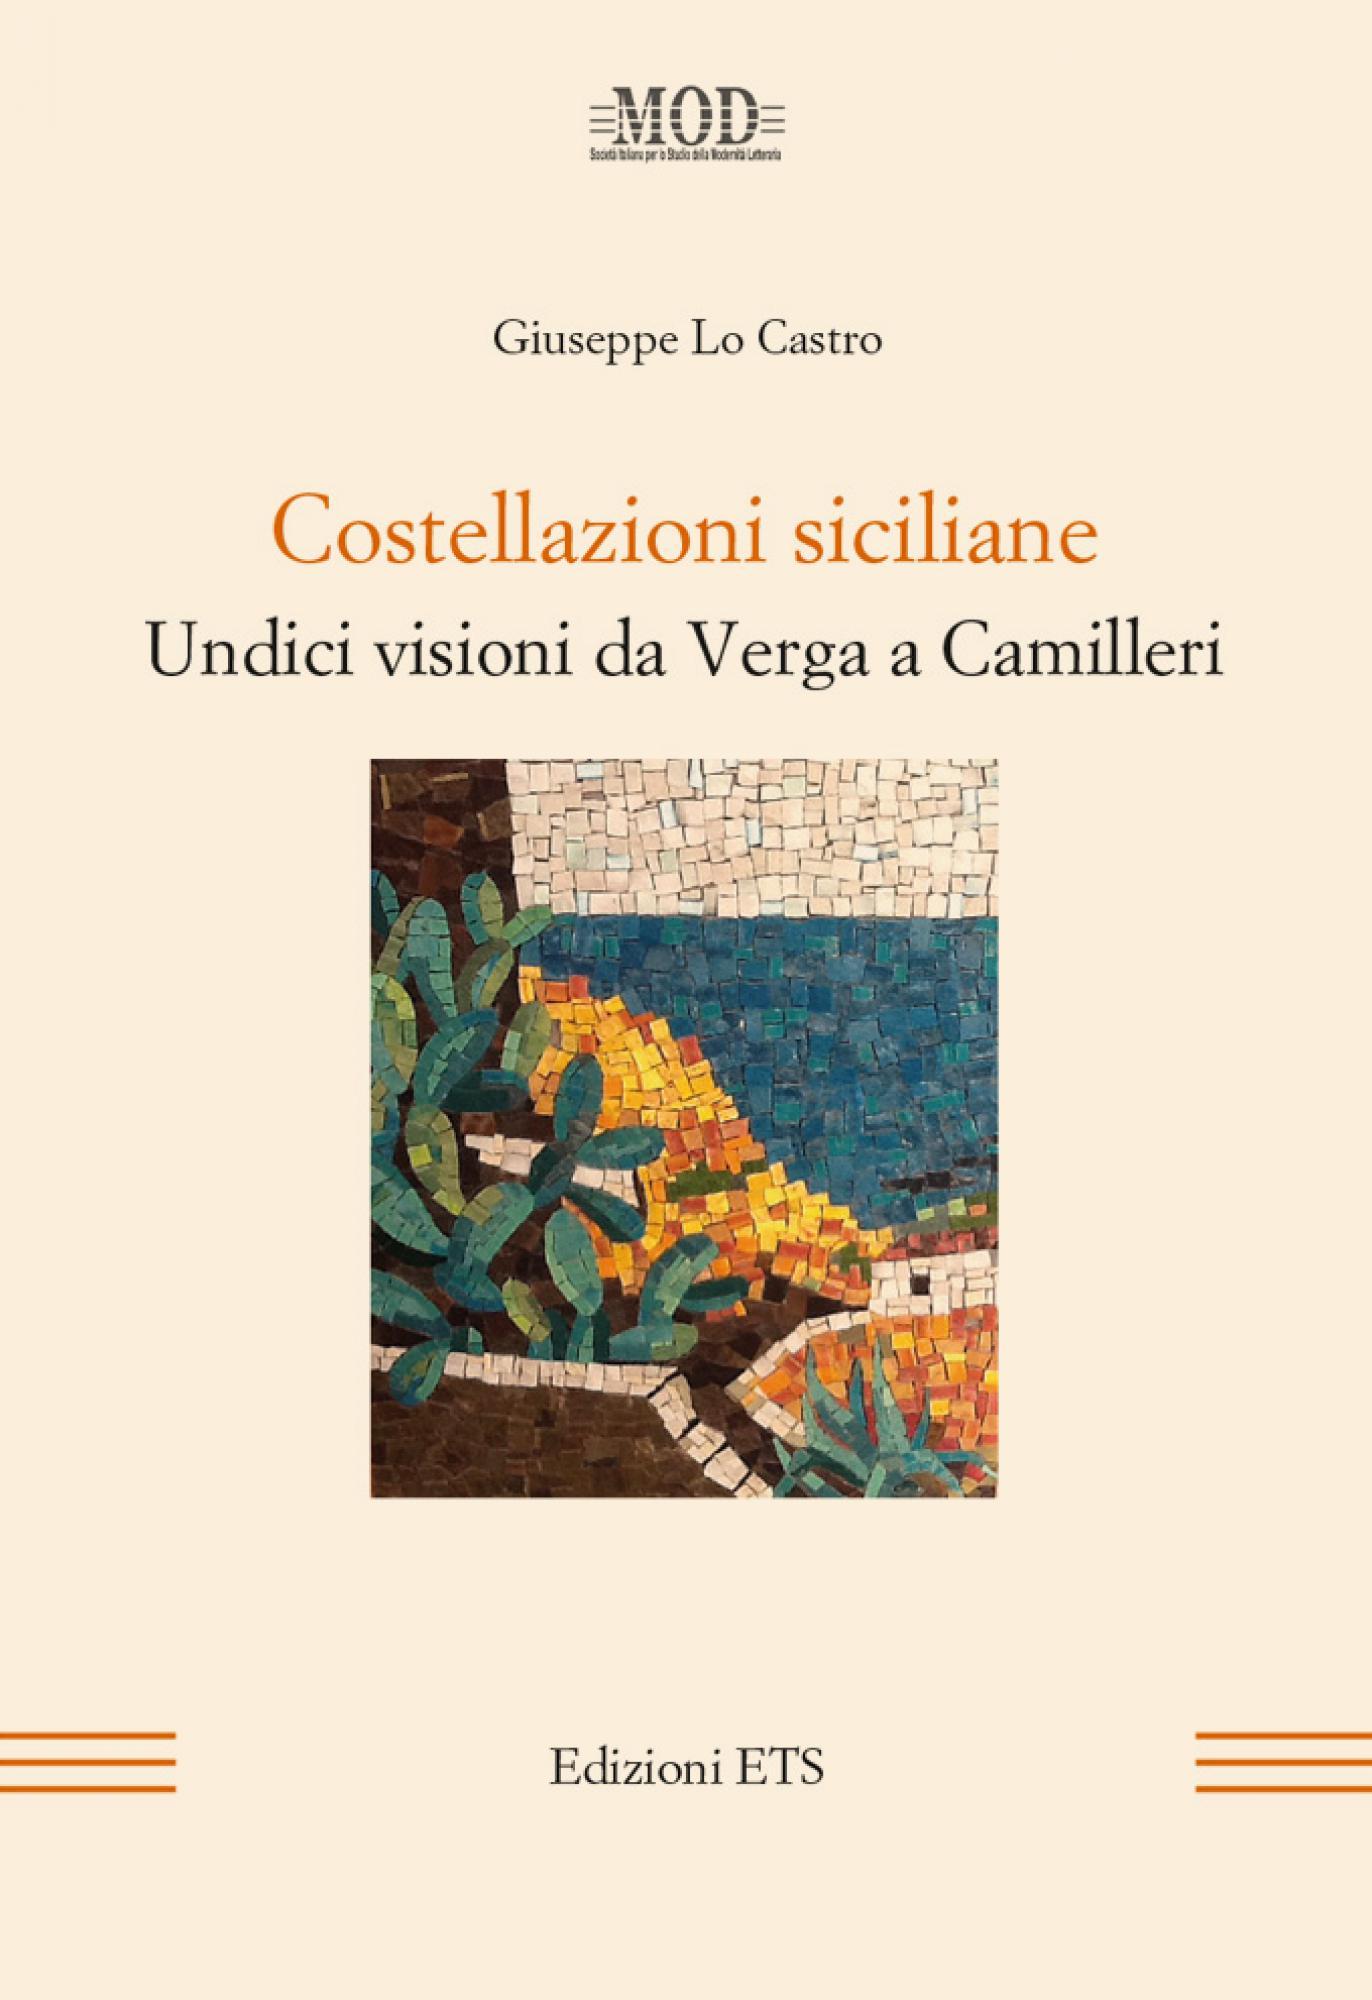 Costellazioni siciliane.Undici visioni da Verga a Camilleri